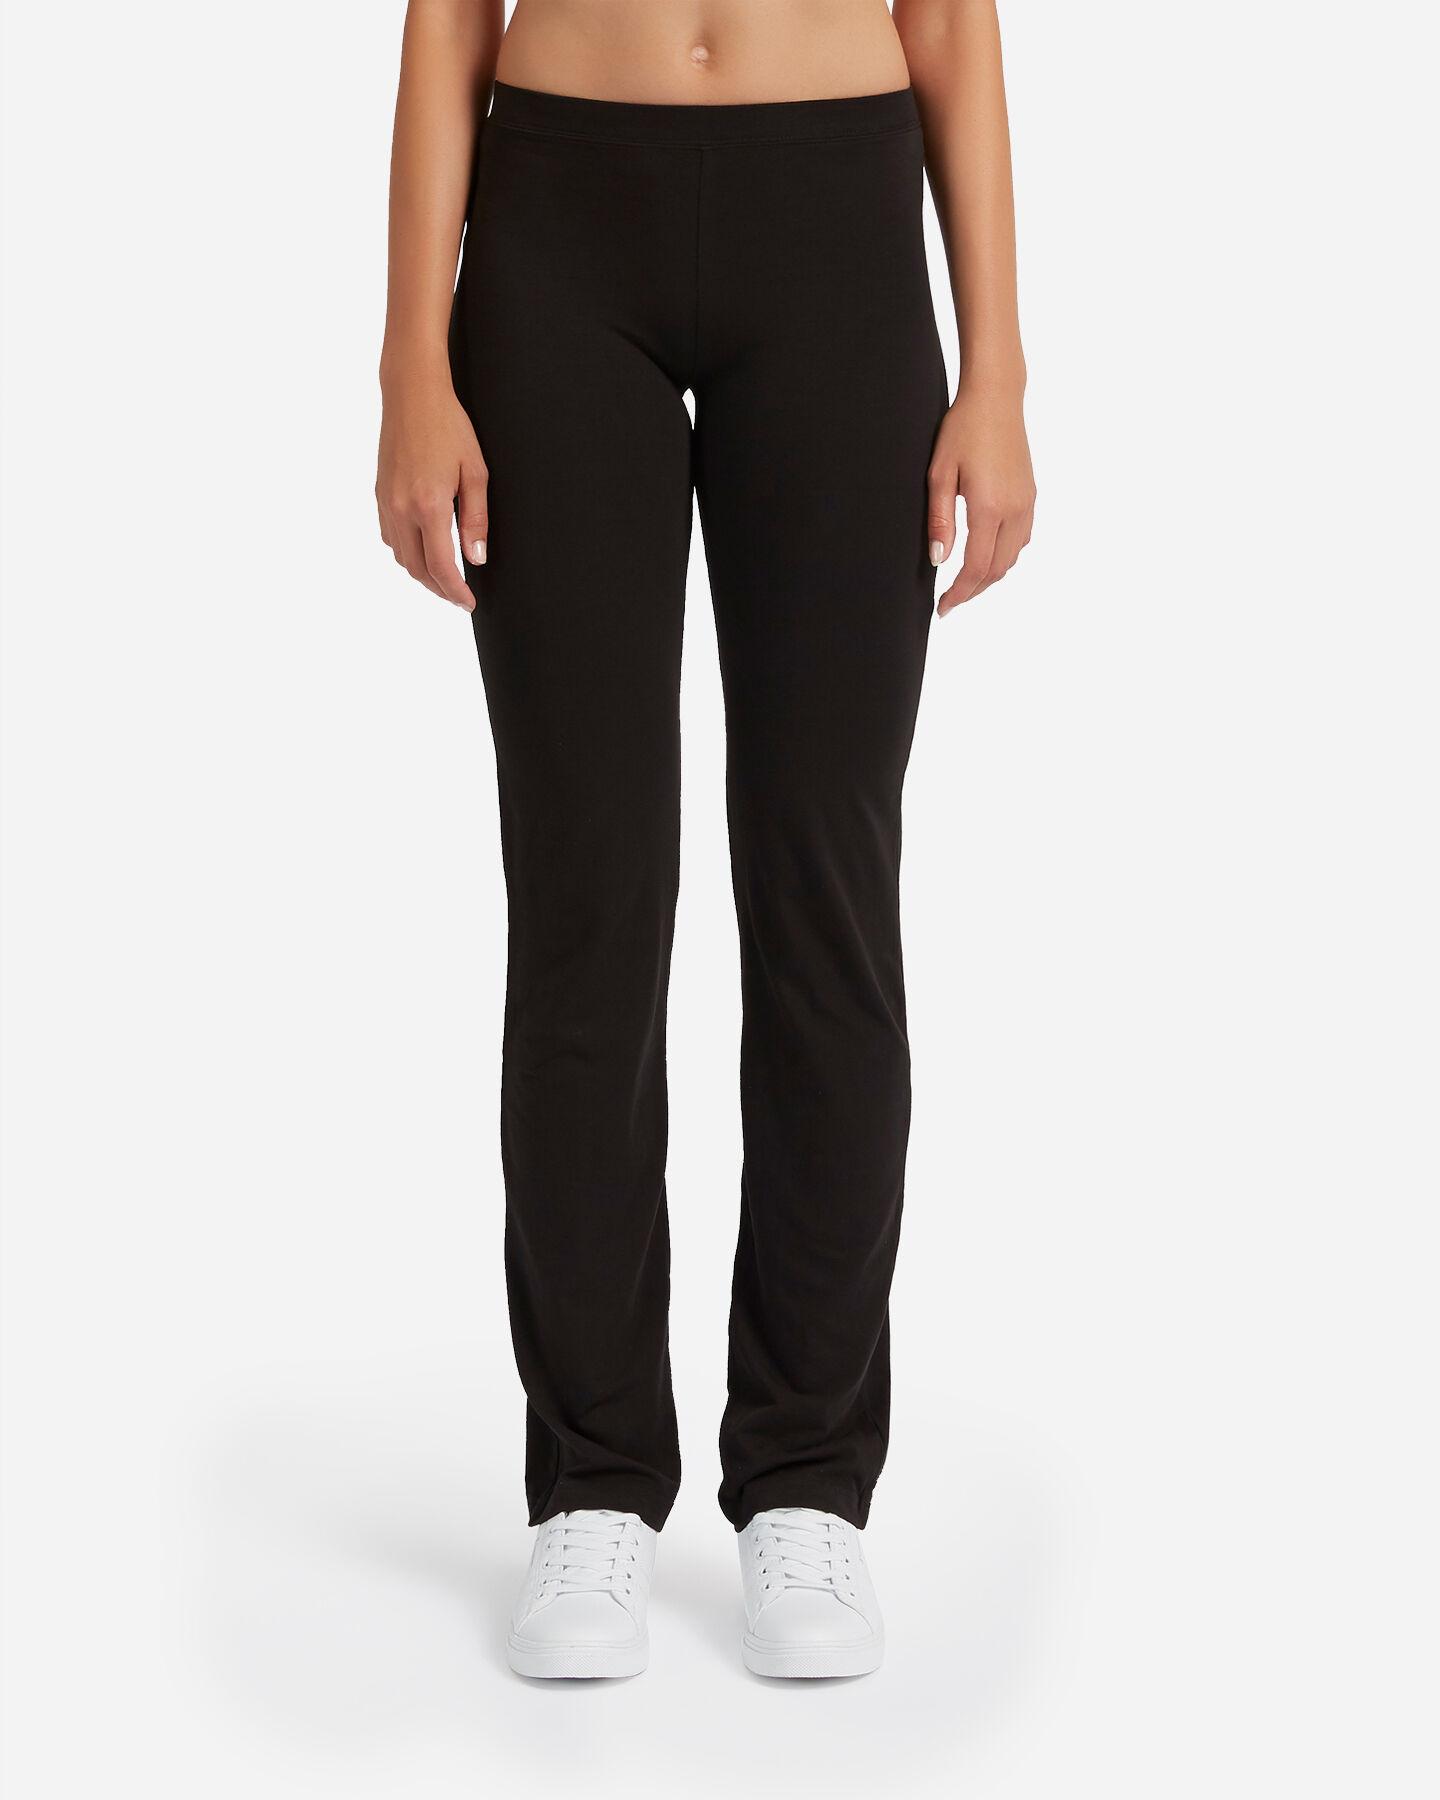 Pantalone ABC PANTAJAZZ W  S1298349 scatto 0